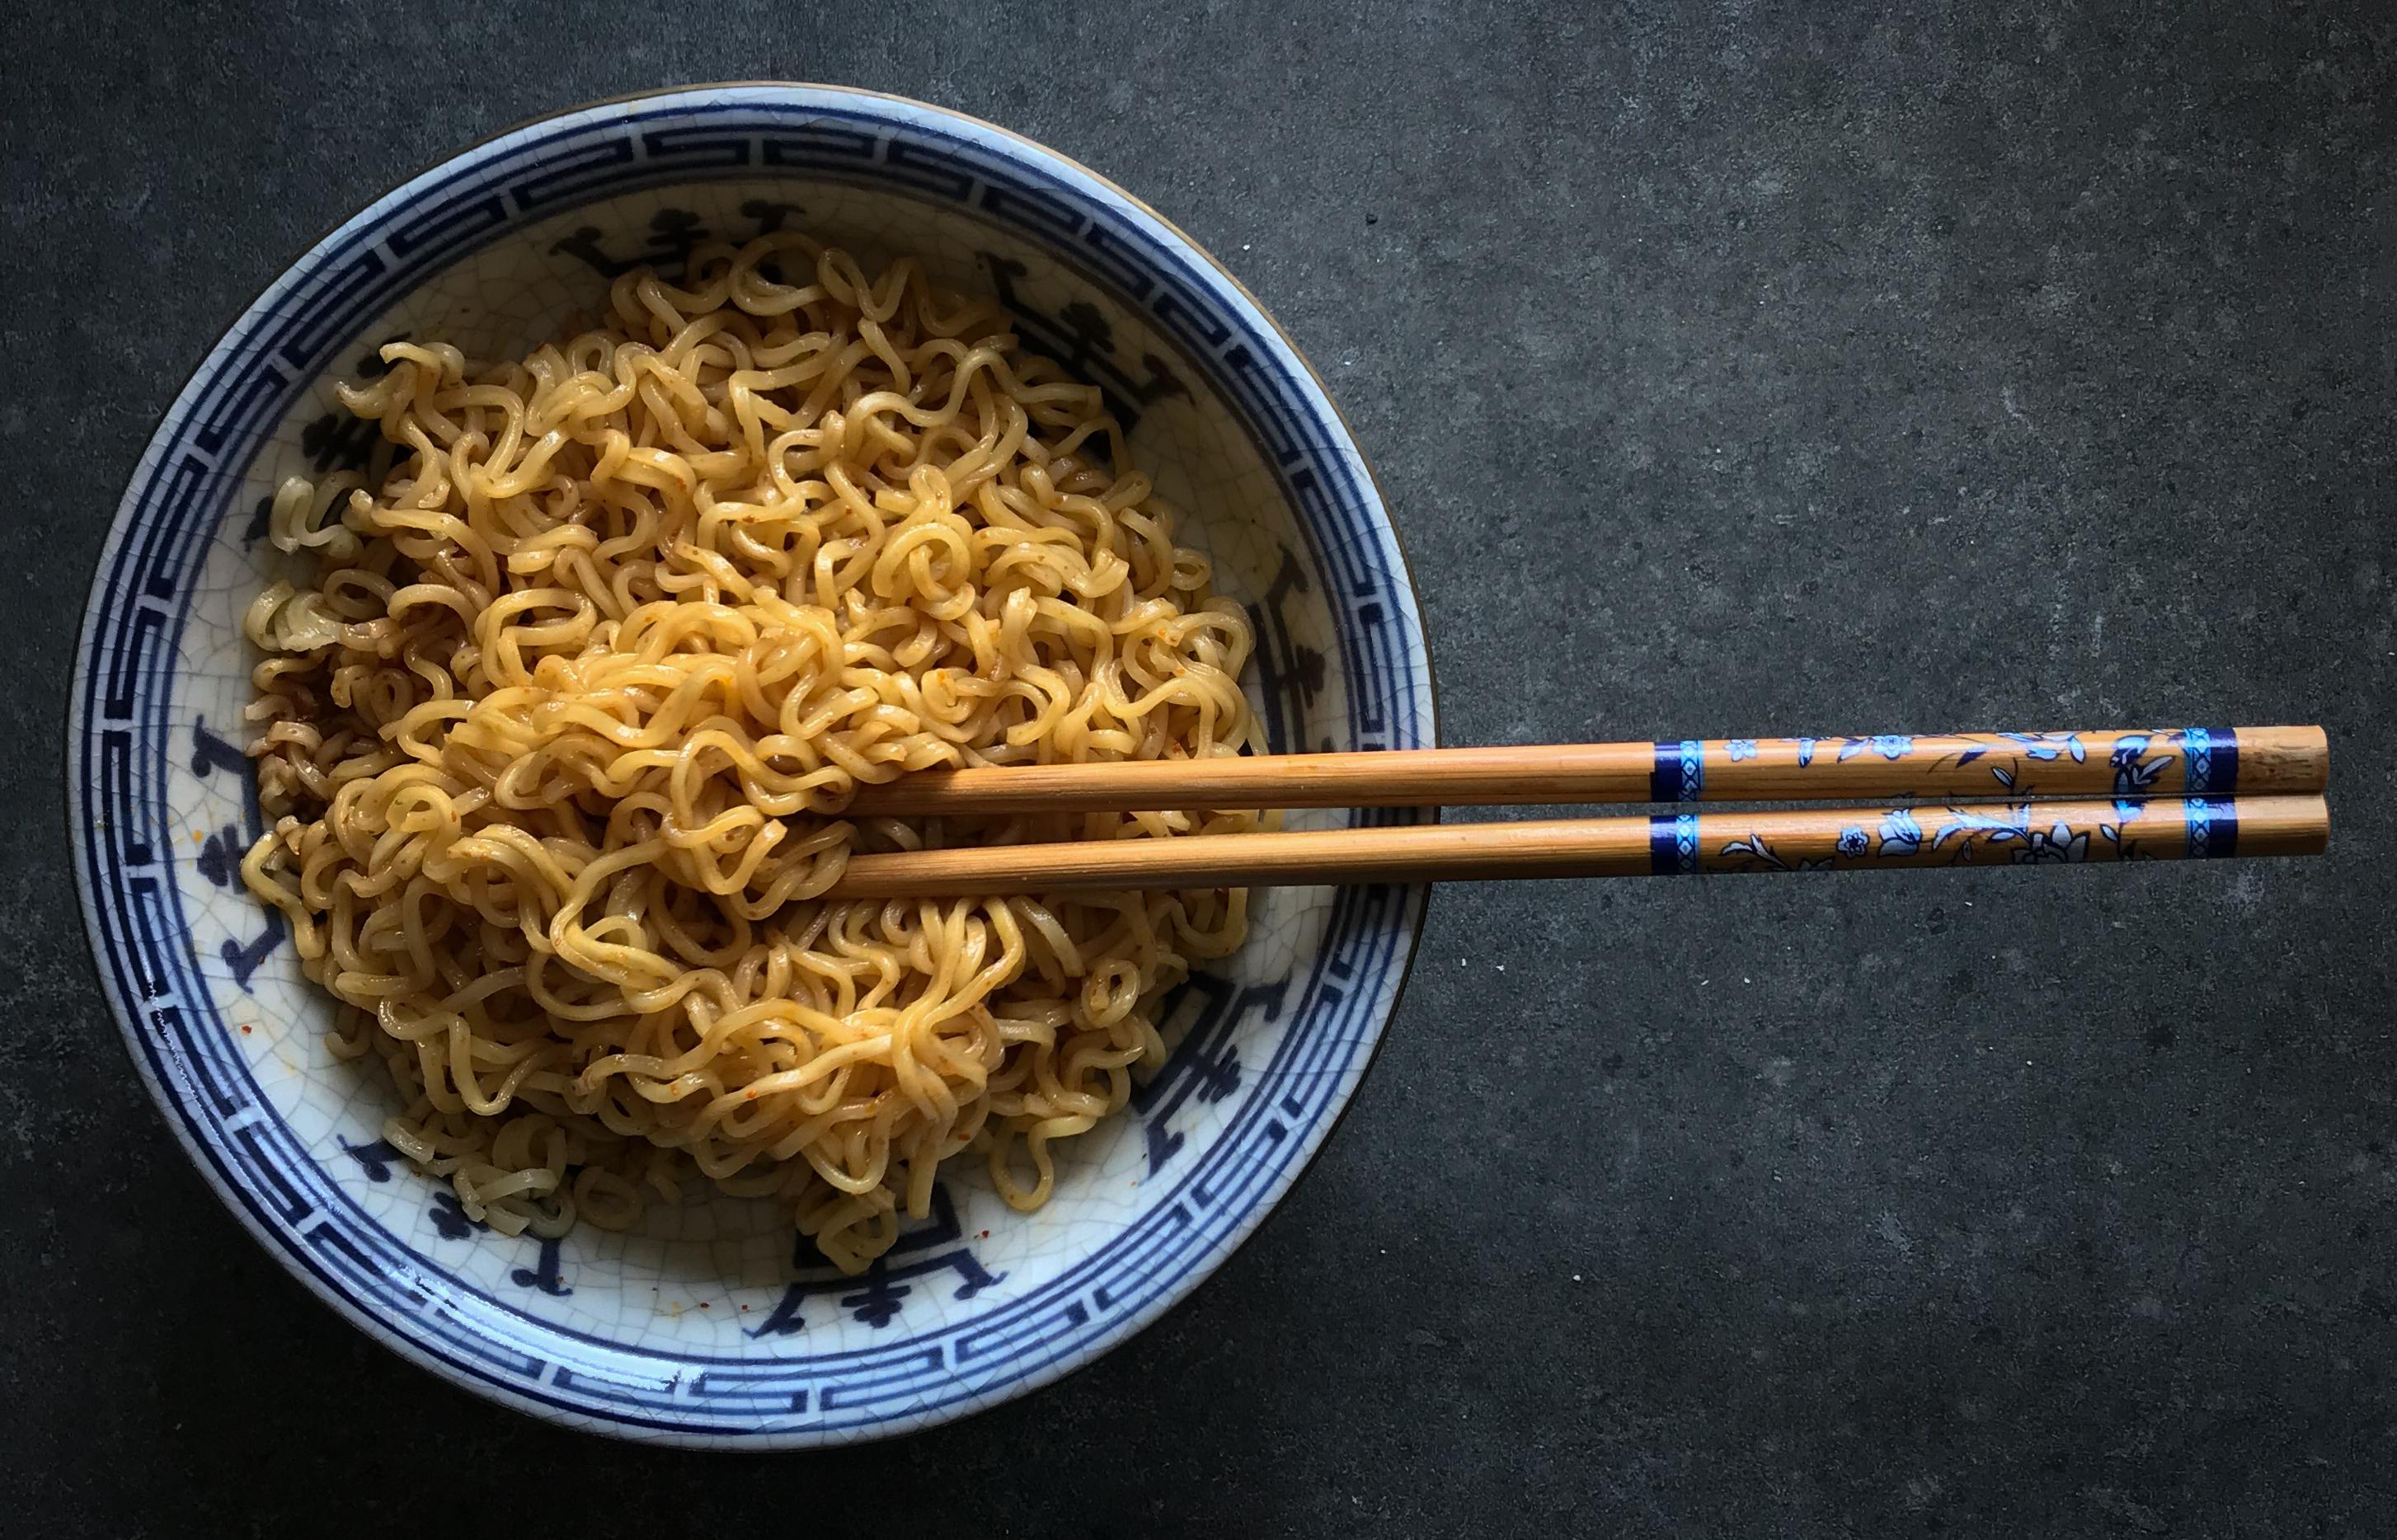 68. Indomie Mi Goreng Hot & Spicy Stir Fry Noodles